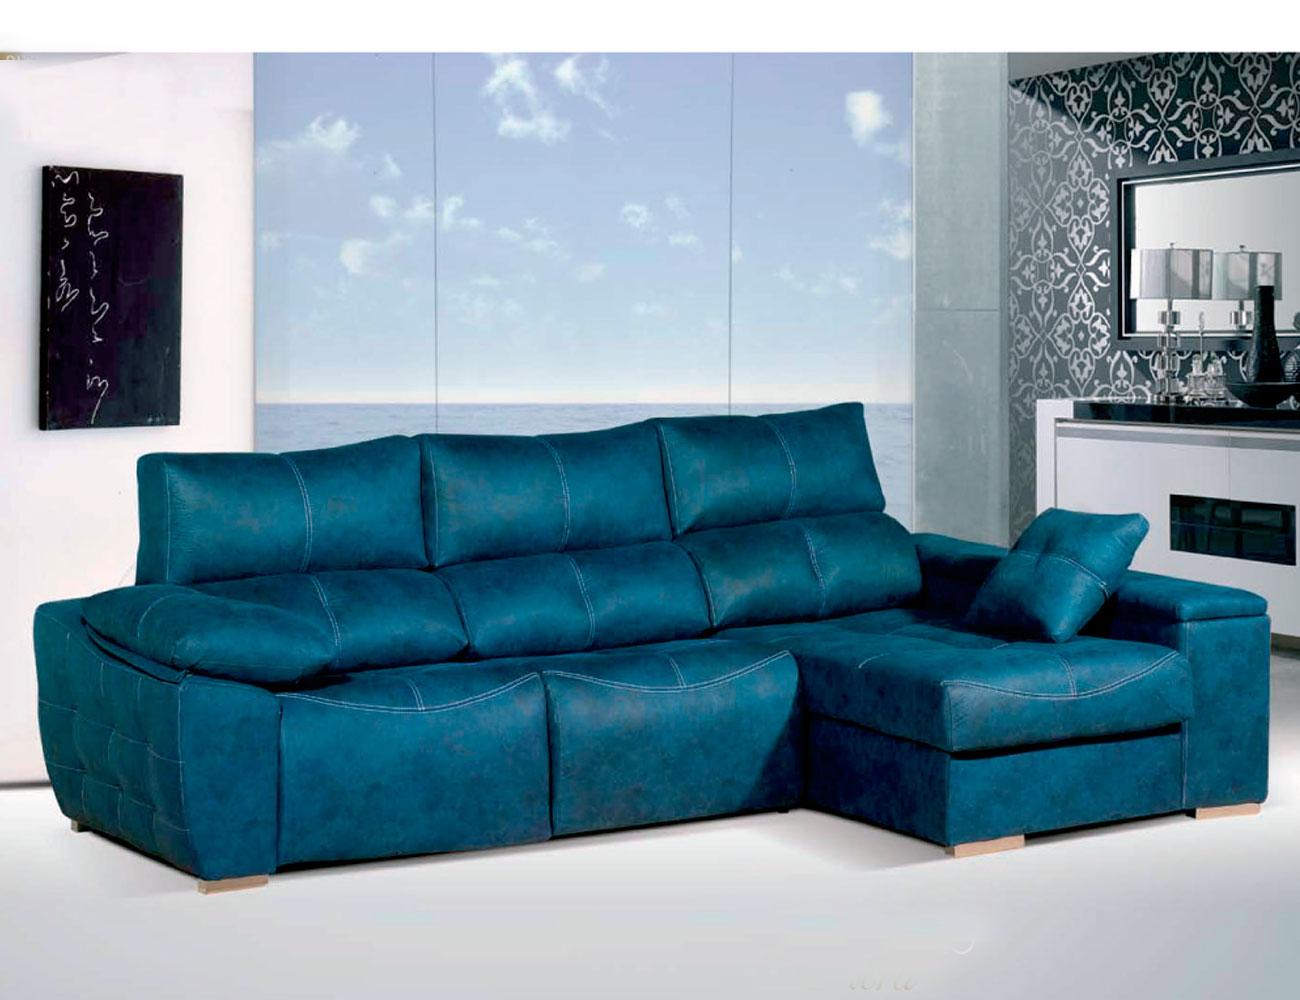 Sofa chaiselongue relax 2 motores anti manchas turquesa6